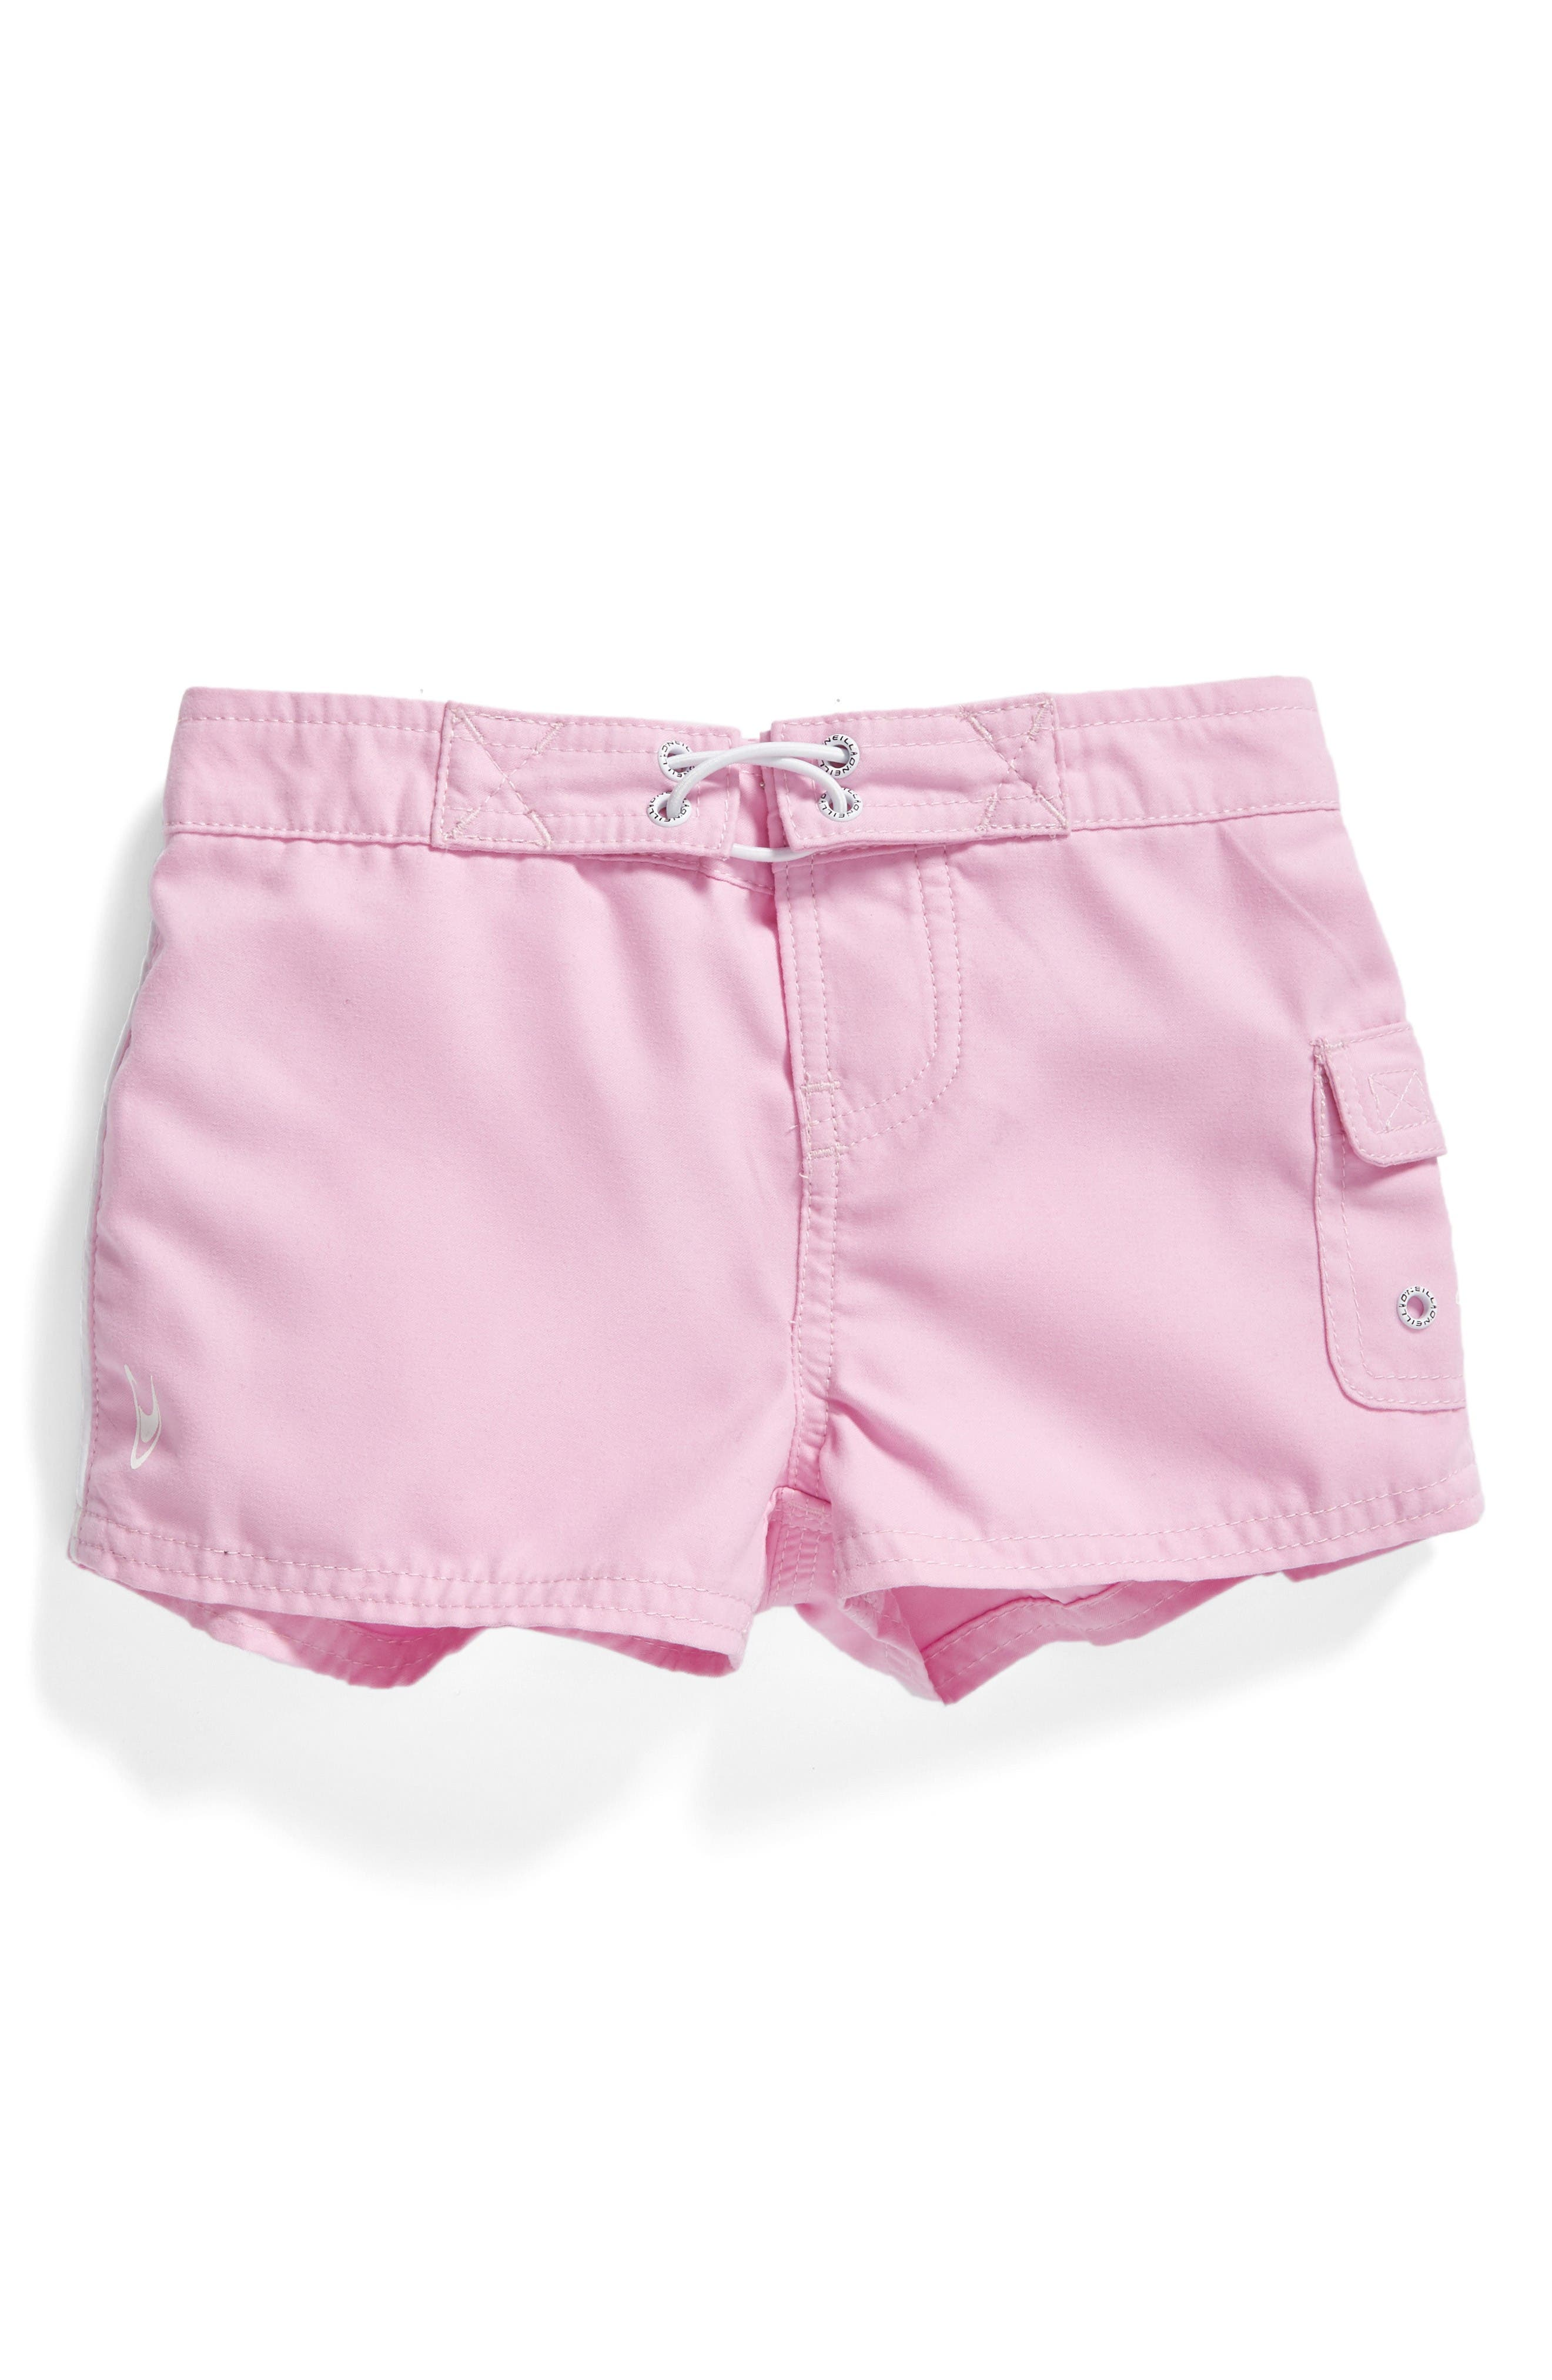 O'NEILL Cowrie Board Shorts